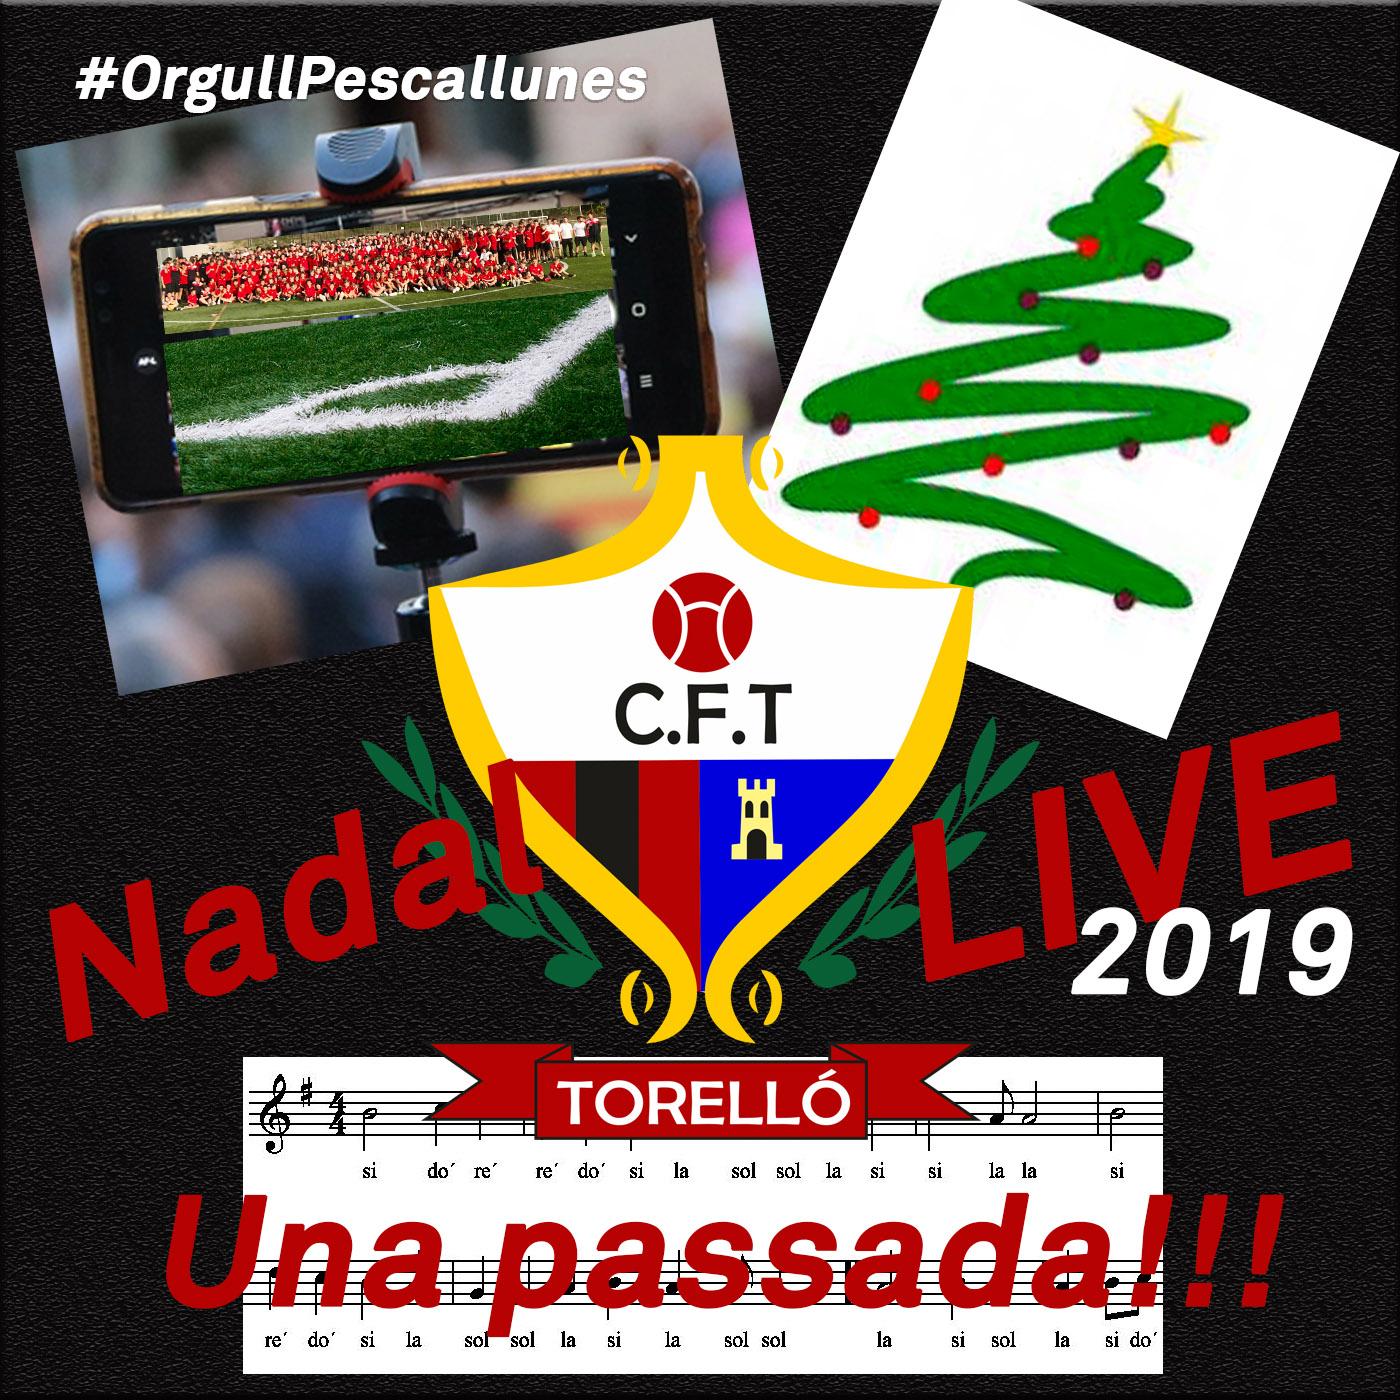 NADAL LIVE 2019